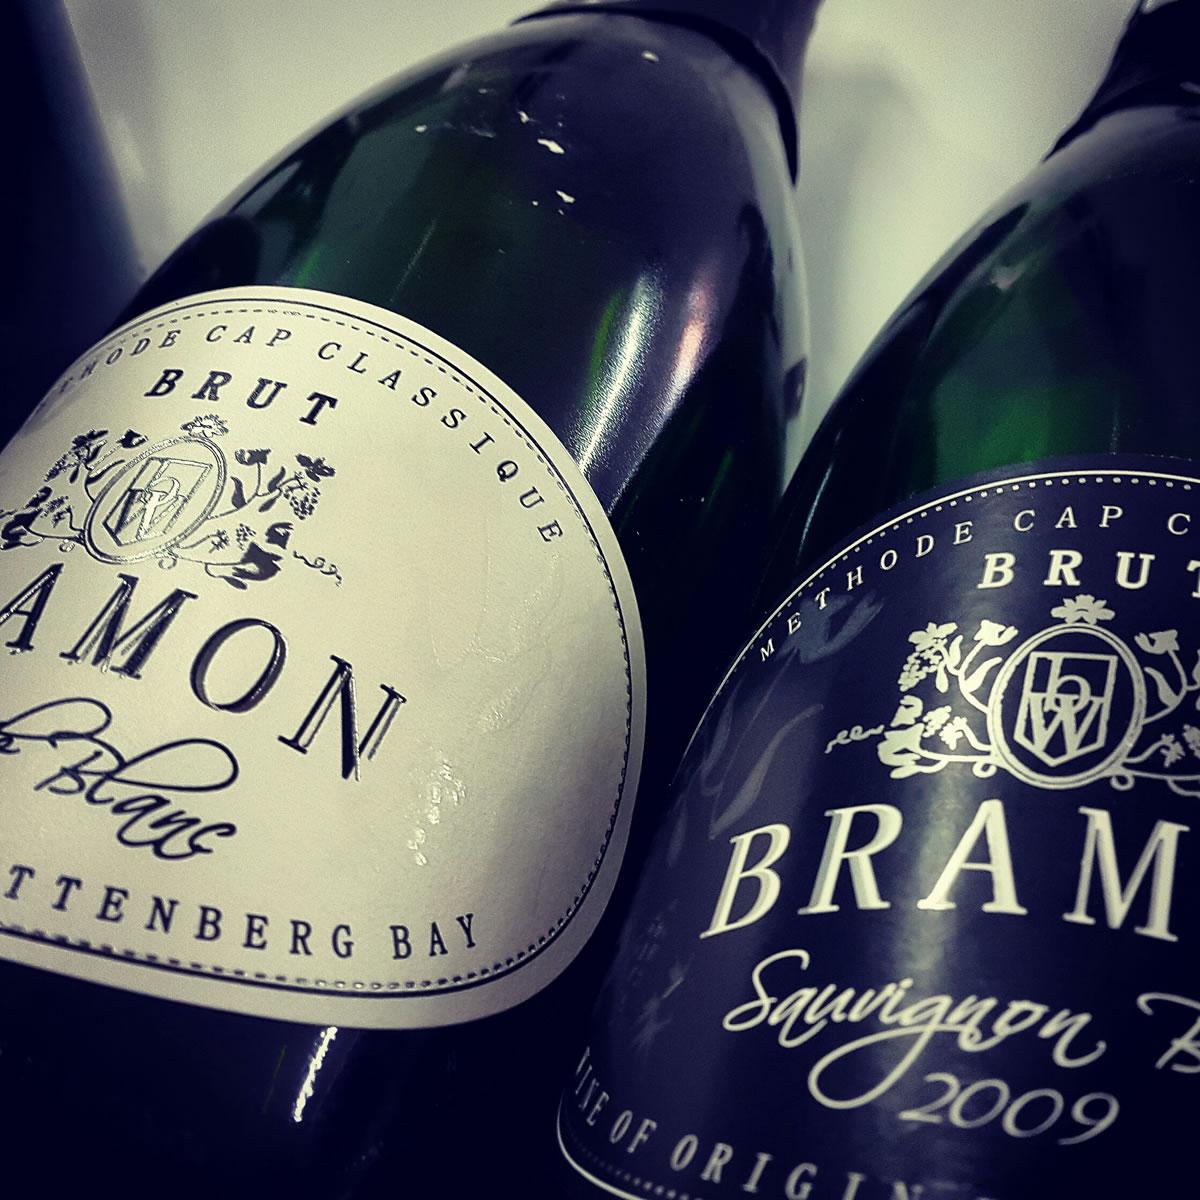 bramon-gallery-bdeb and Sauv MCC labels